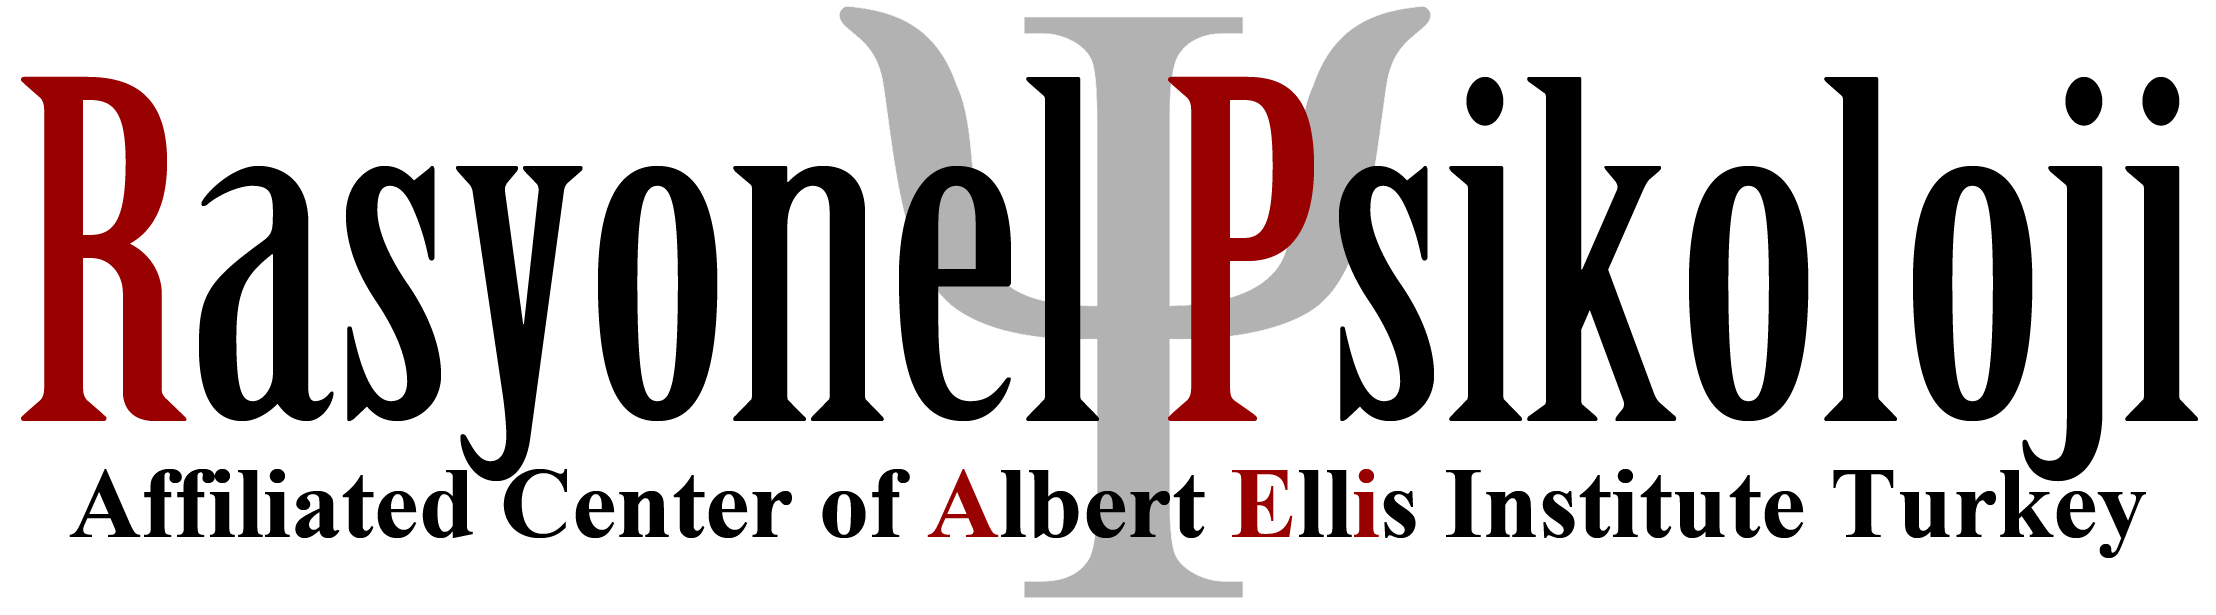 rasyonel-psikoloji-logo-site